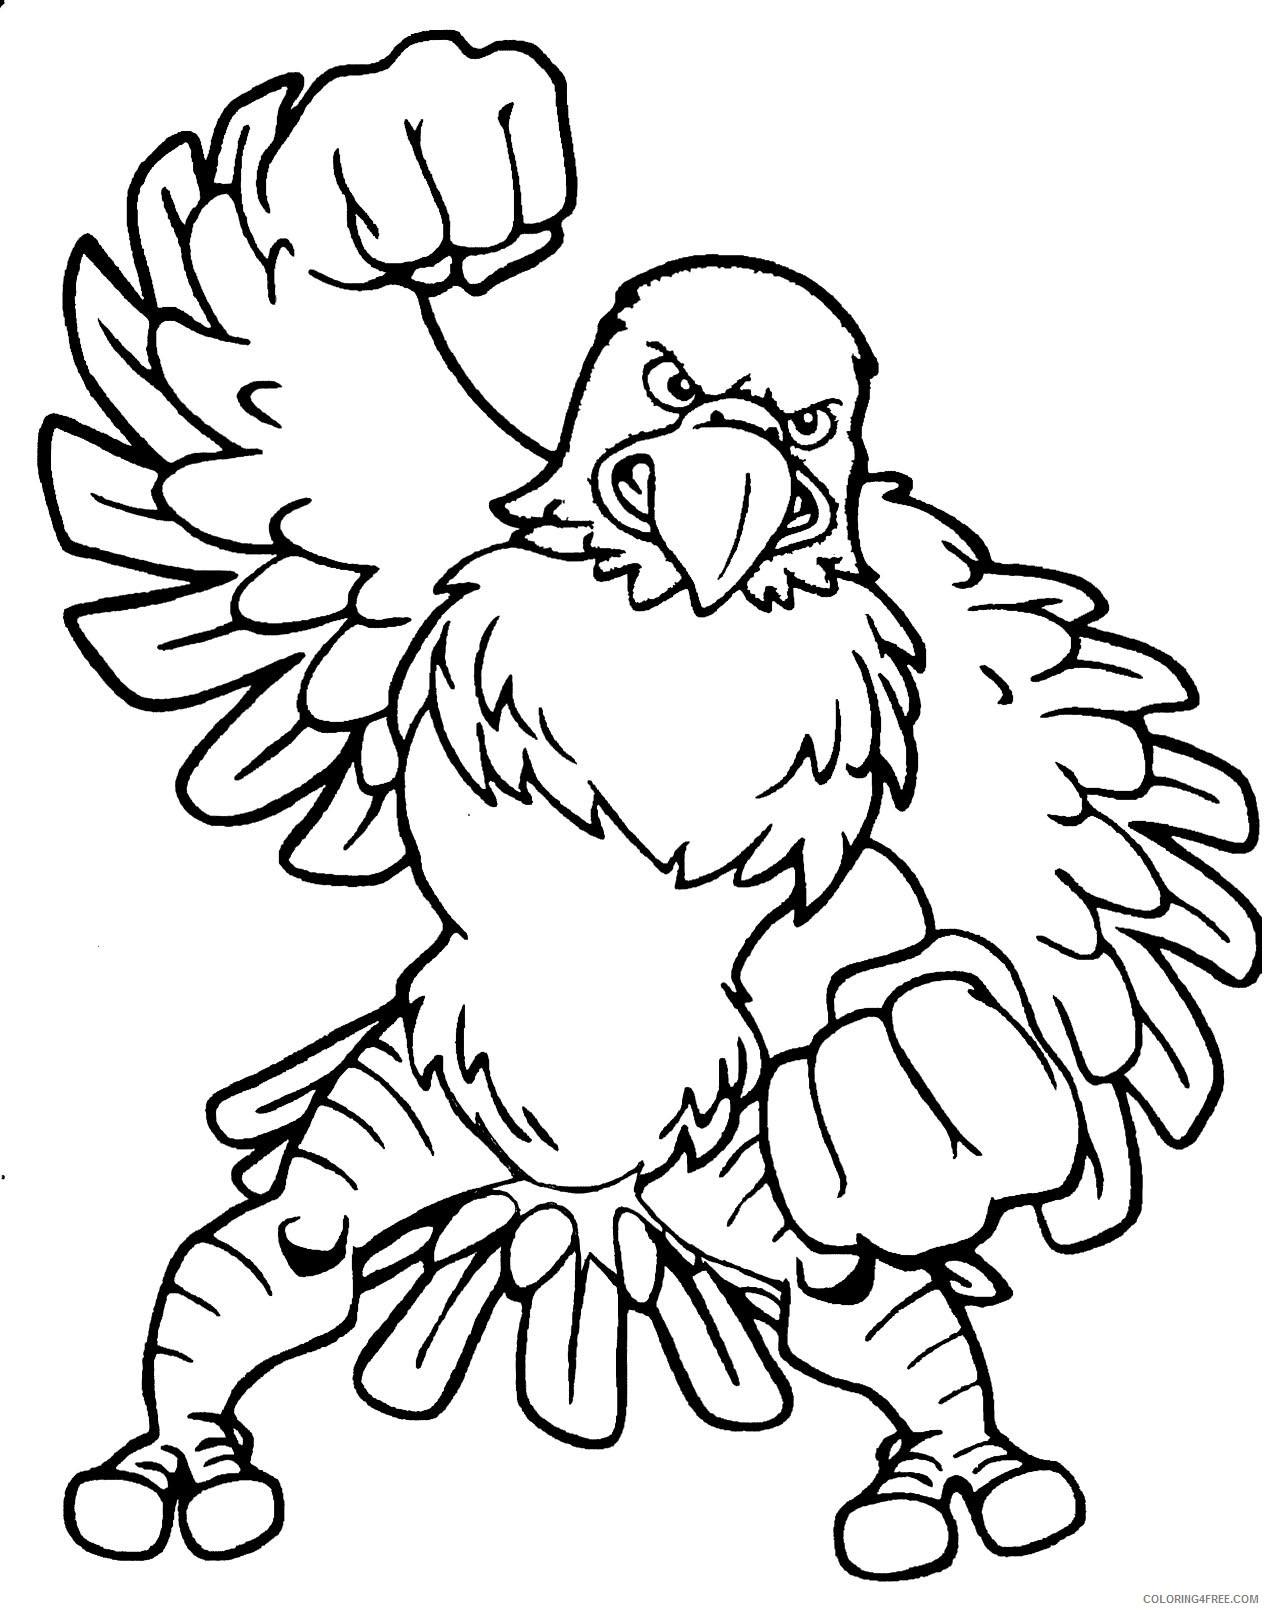 Mascot Eagles Coloring Pages Eagle Mascot Free Cliparts Printable Coloring4free Coloring4free Com